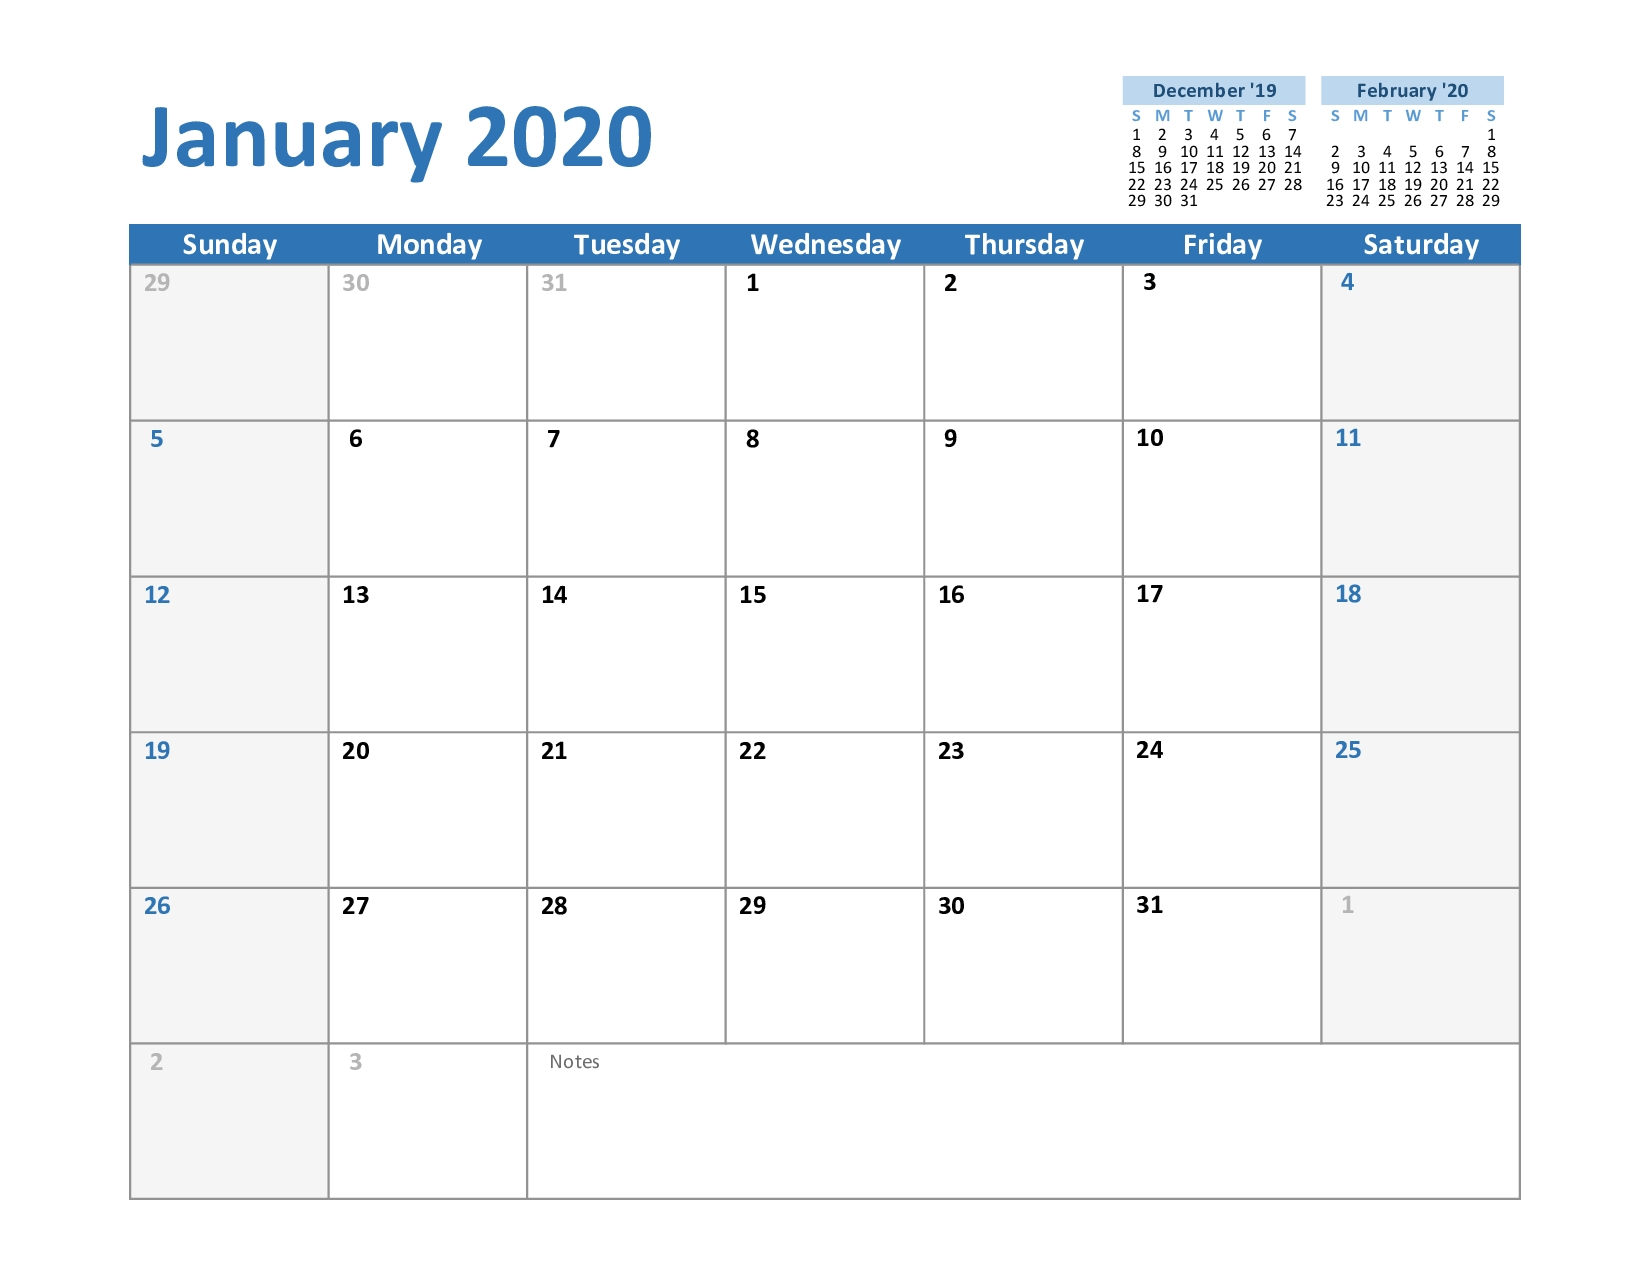 Blank January 2020 Calendar Printable In Pdf, Word, Excel throughout 2020 Julian Calendar Printable Pdf